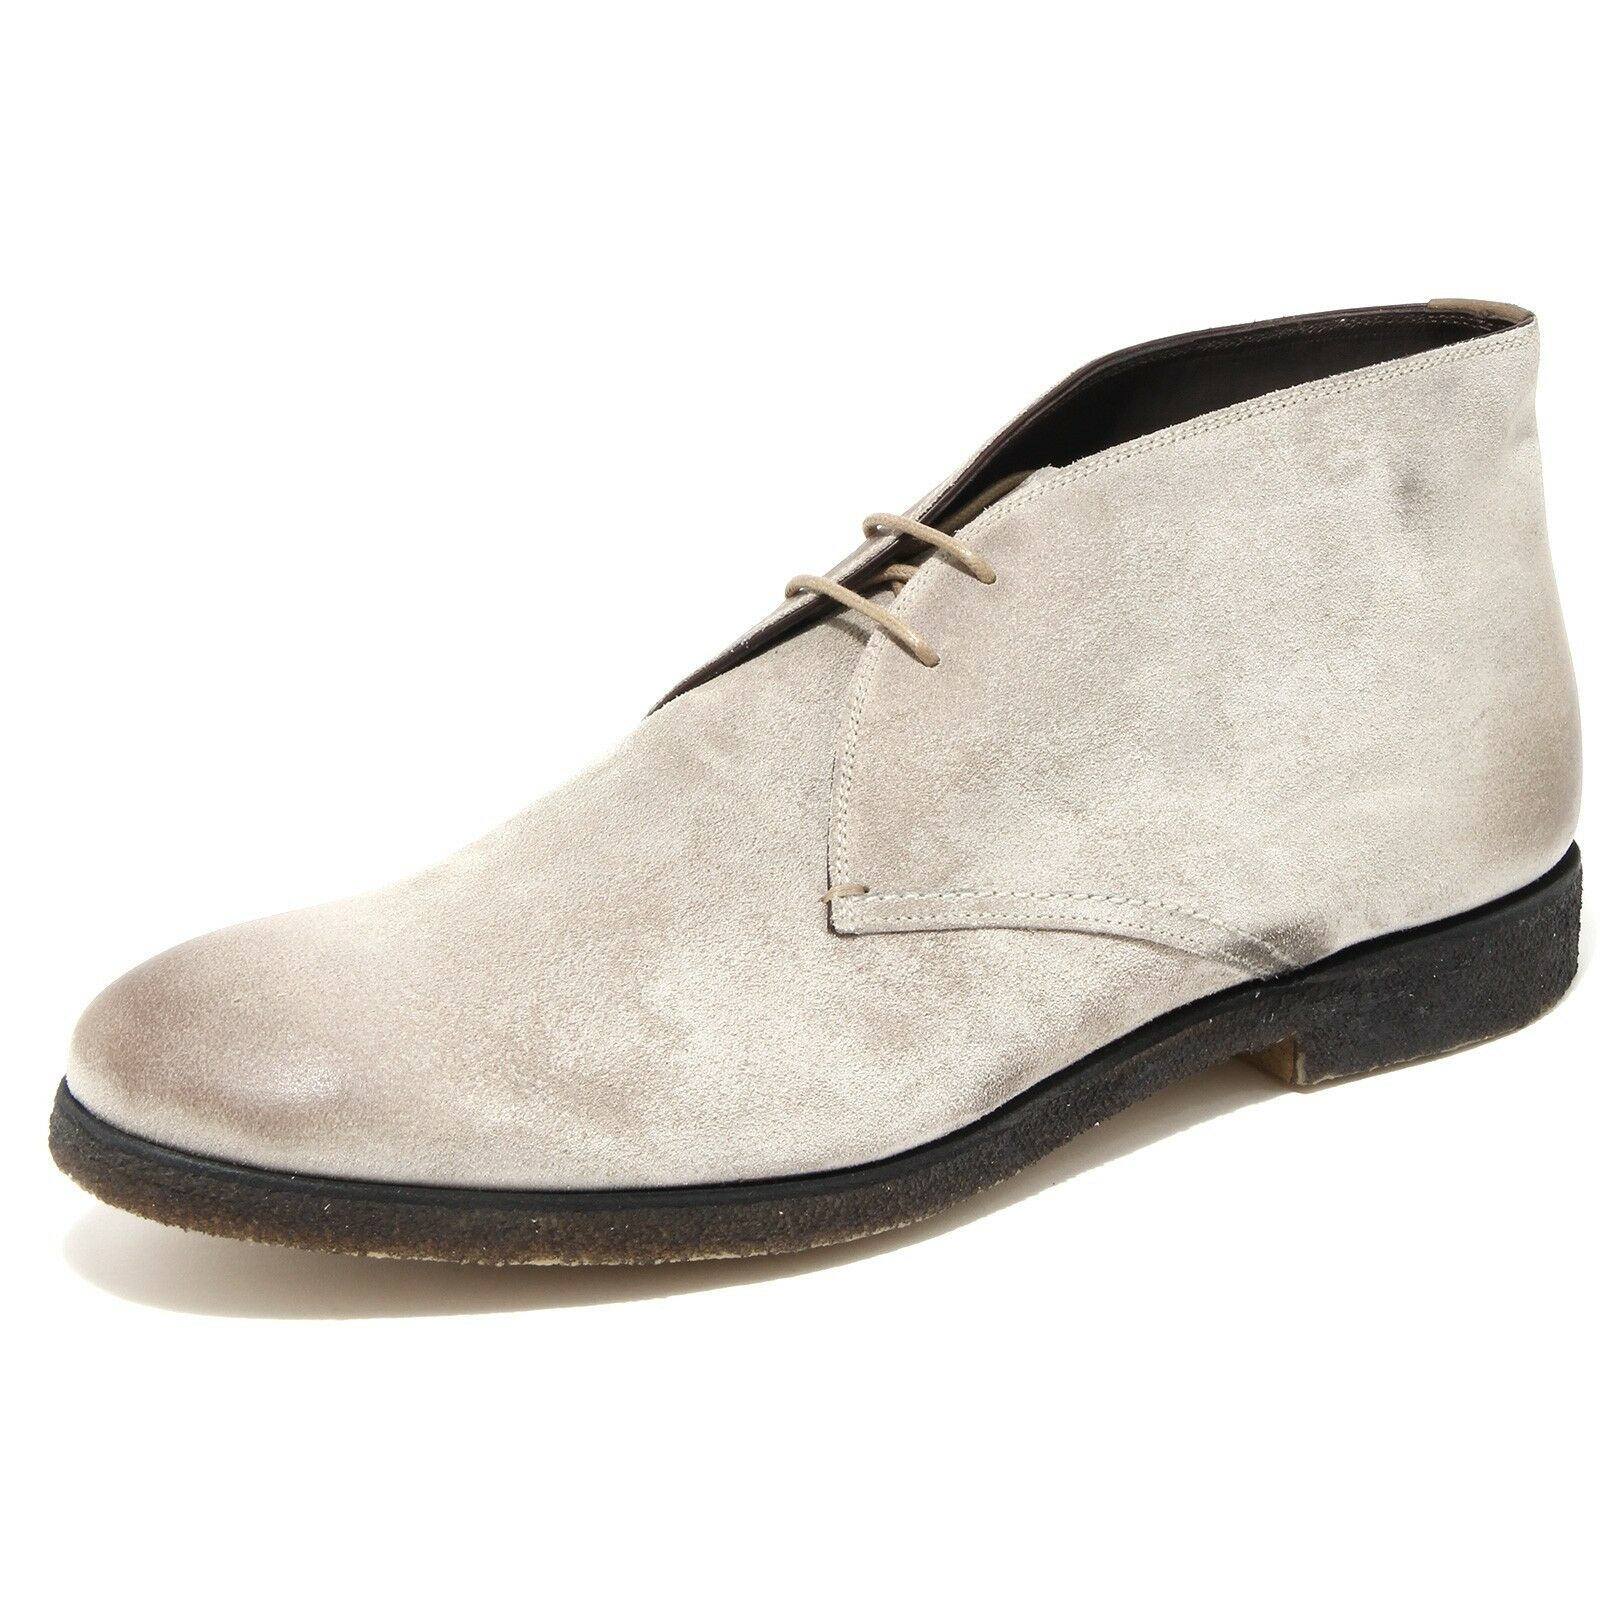 Scarpe casual da uomo  34721 polacchino CAR SHOE scarpa uomo shoes uomo